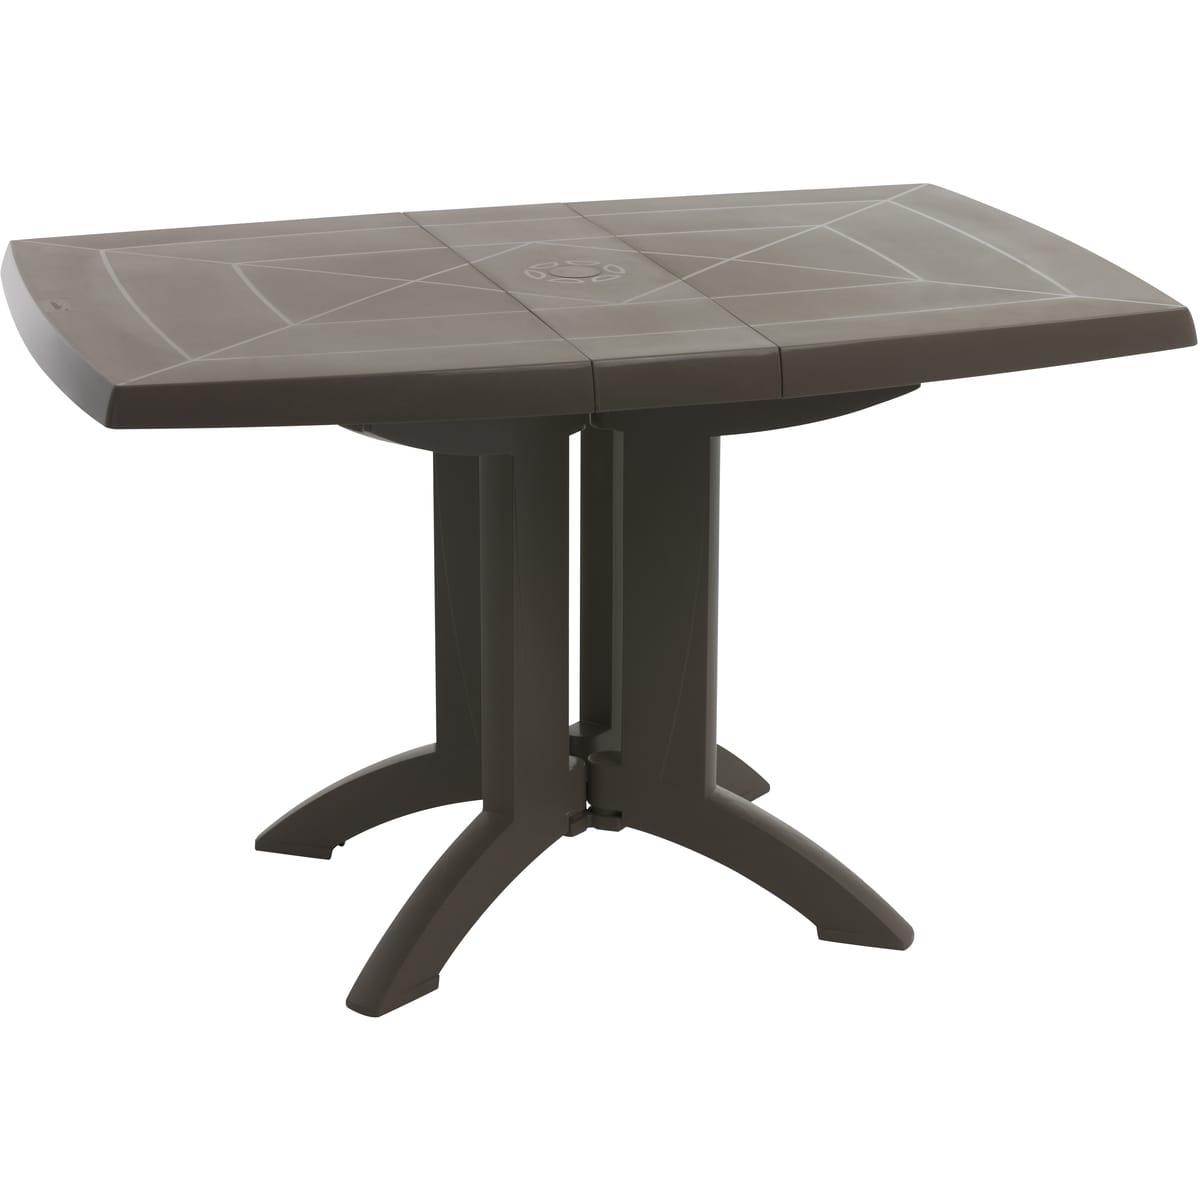 Grosfillex Table De Jardin Pliante 118X77Cm Résine Taupe Vega avec Table De Jardin Auchan